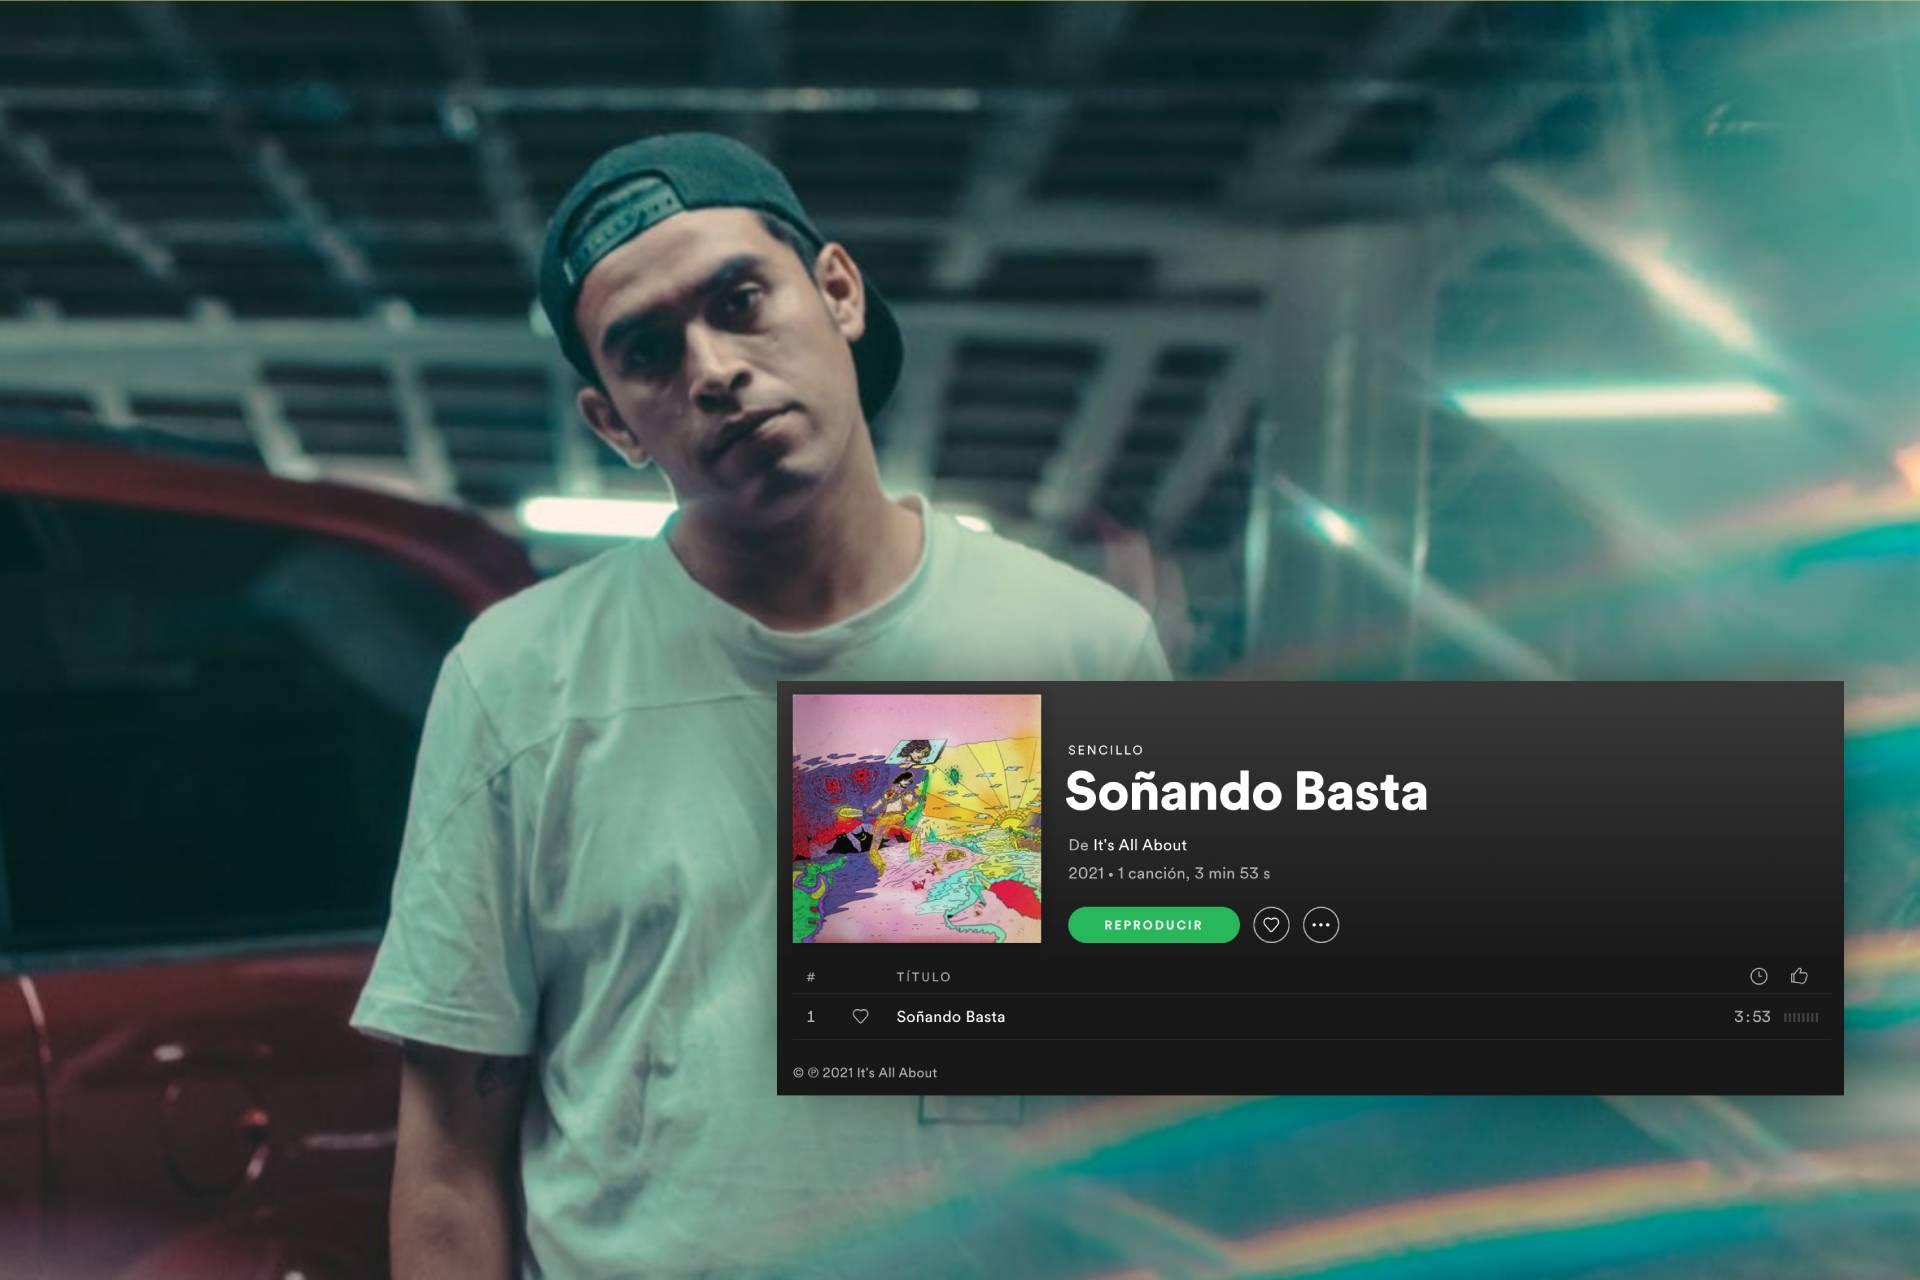 soñando basta-pony records-its all about-Tlaxcala-Música